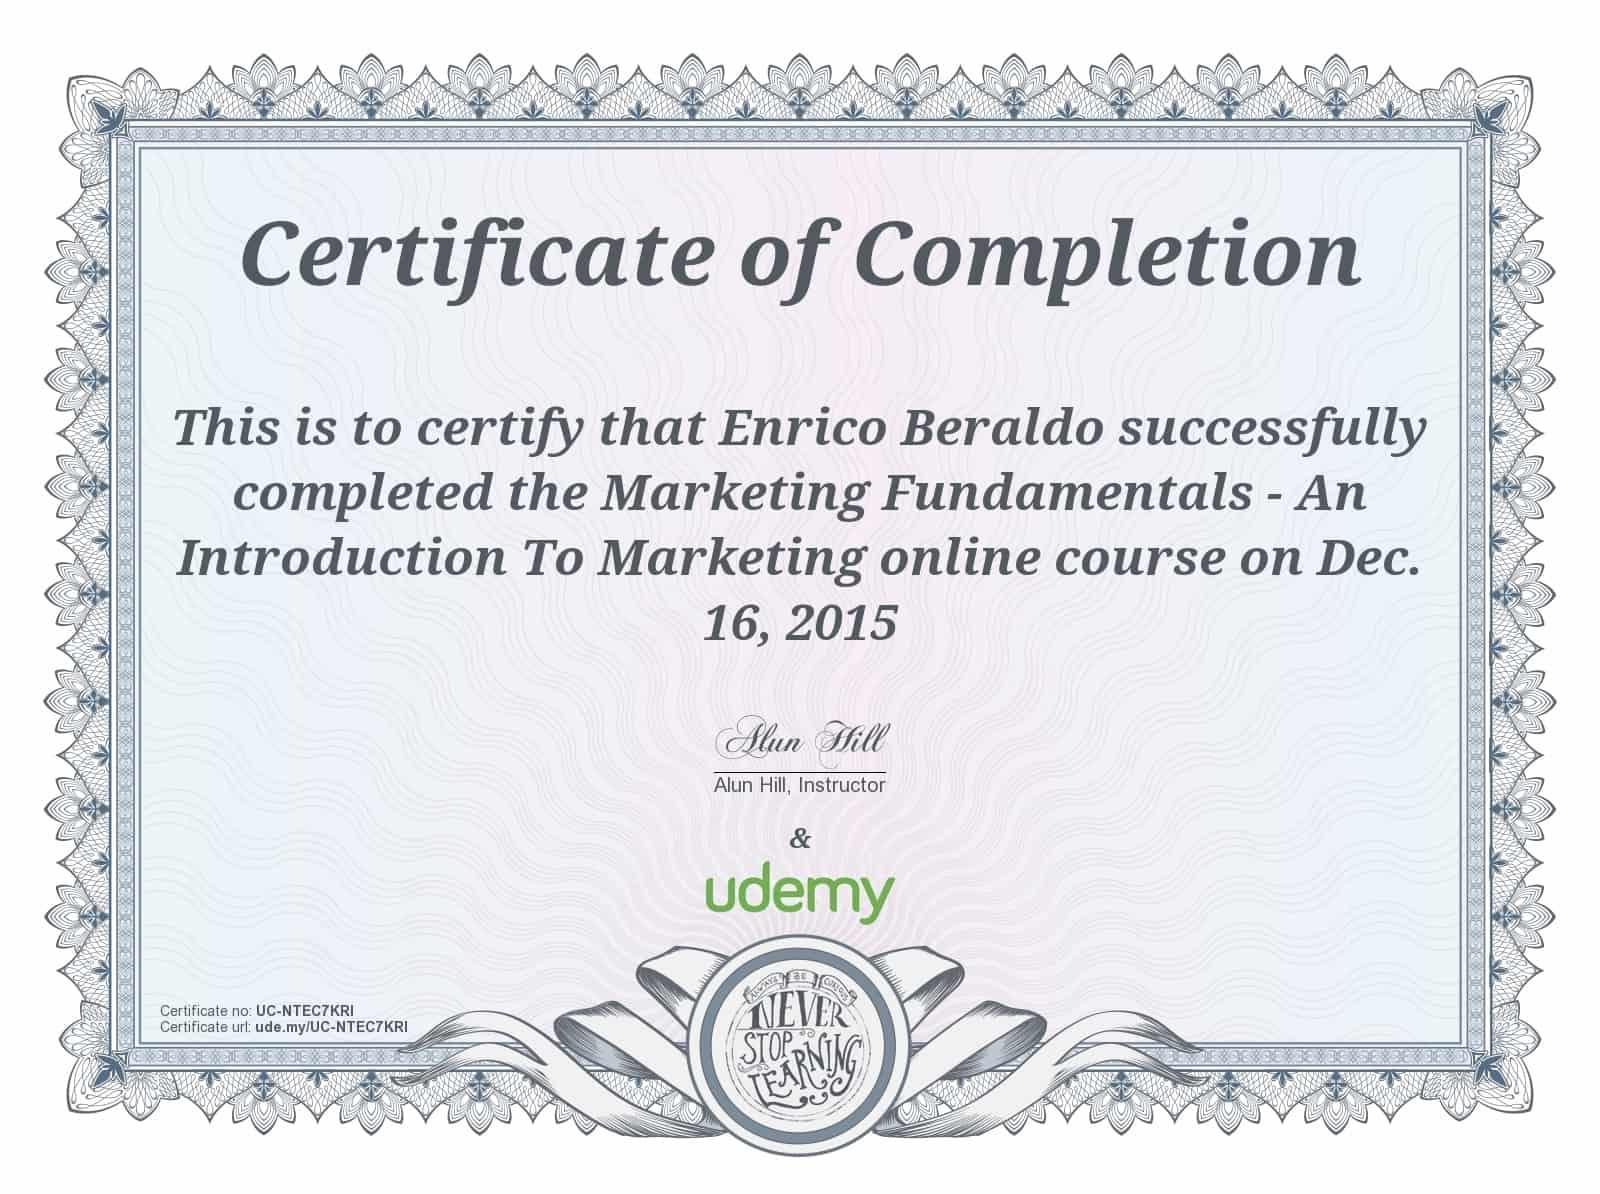 Corso in online marketing